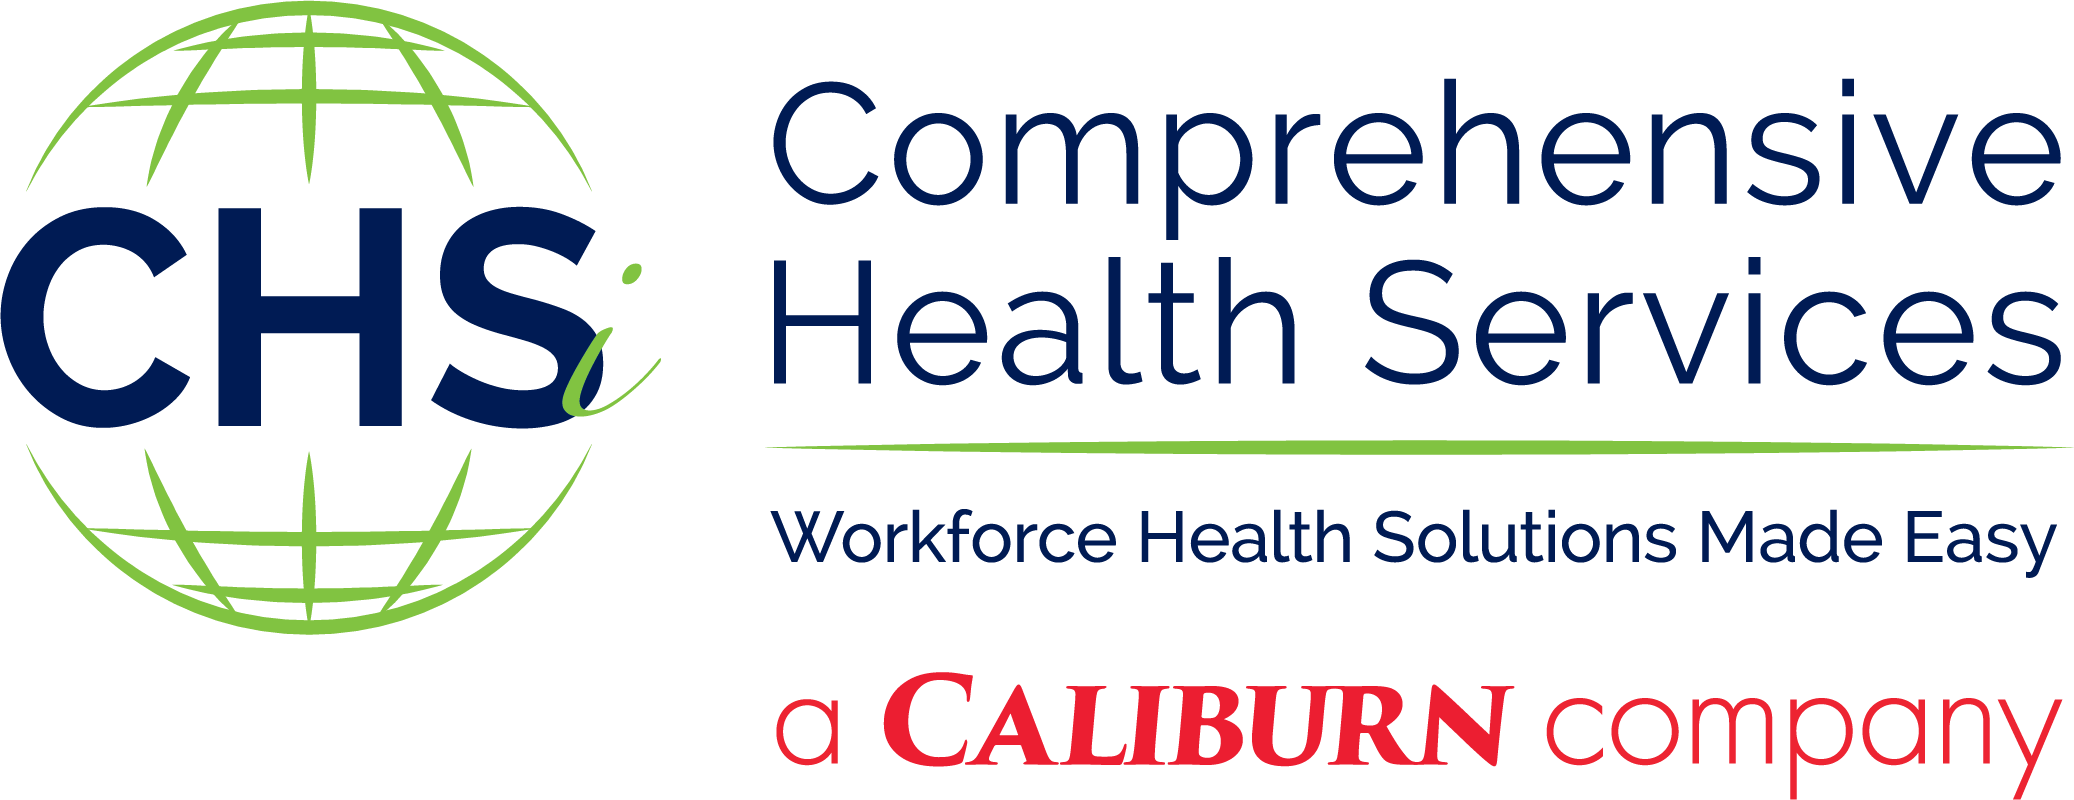 CHS Logo_+tagline_+Caliburn_horz_October2018